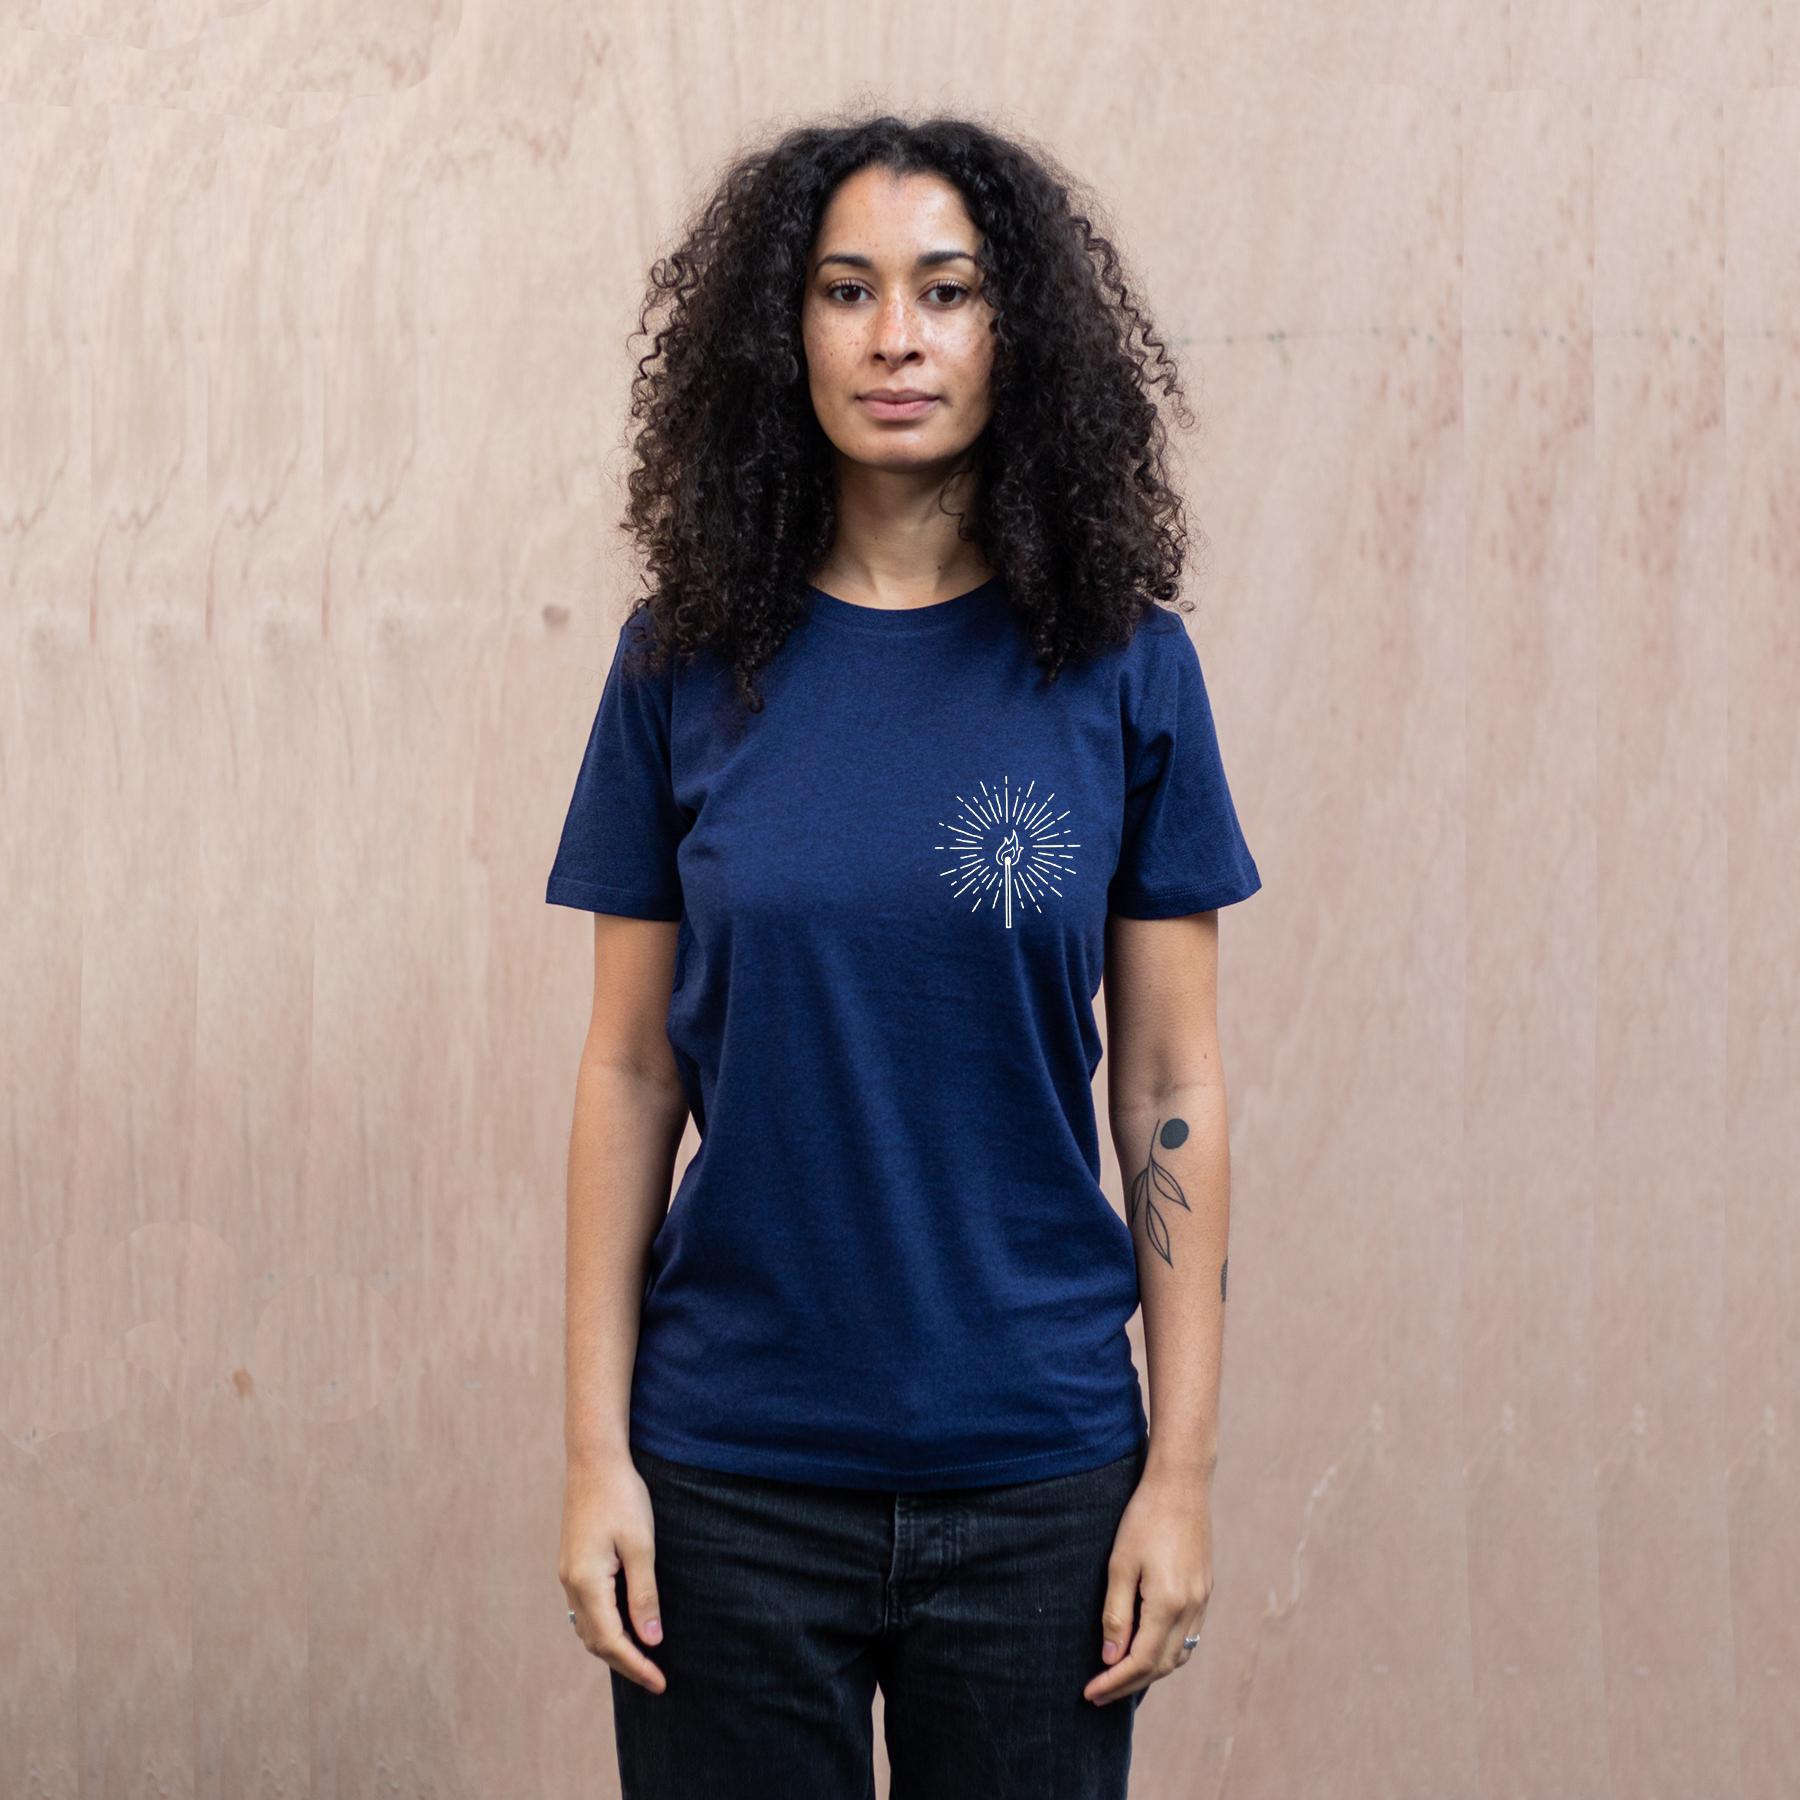 Burn-Bright-organic-t-shirt-womens-The-level-Collective.jpg